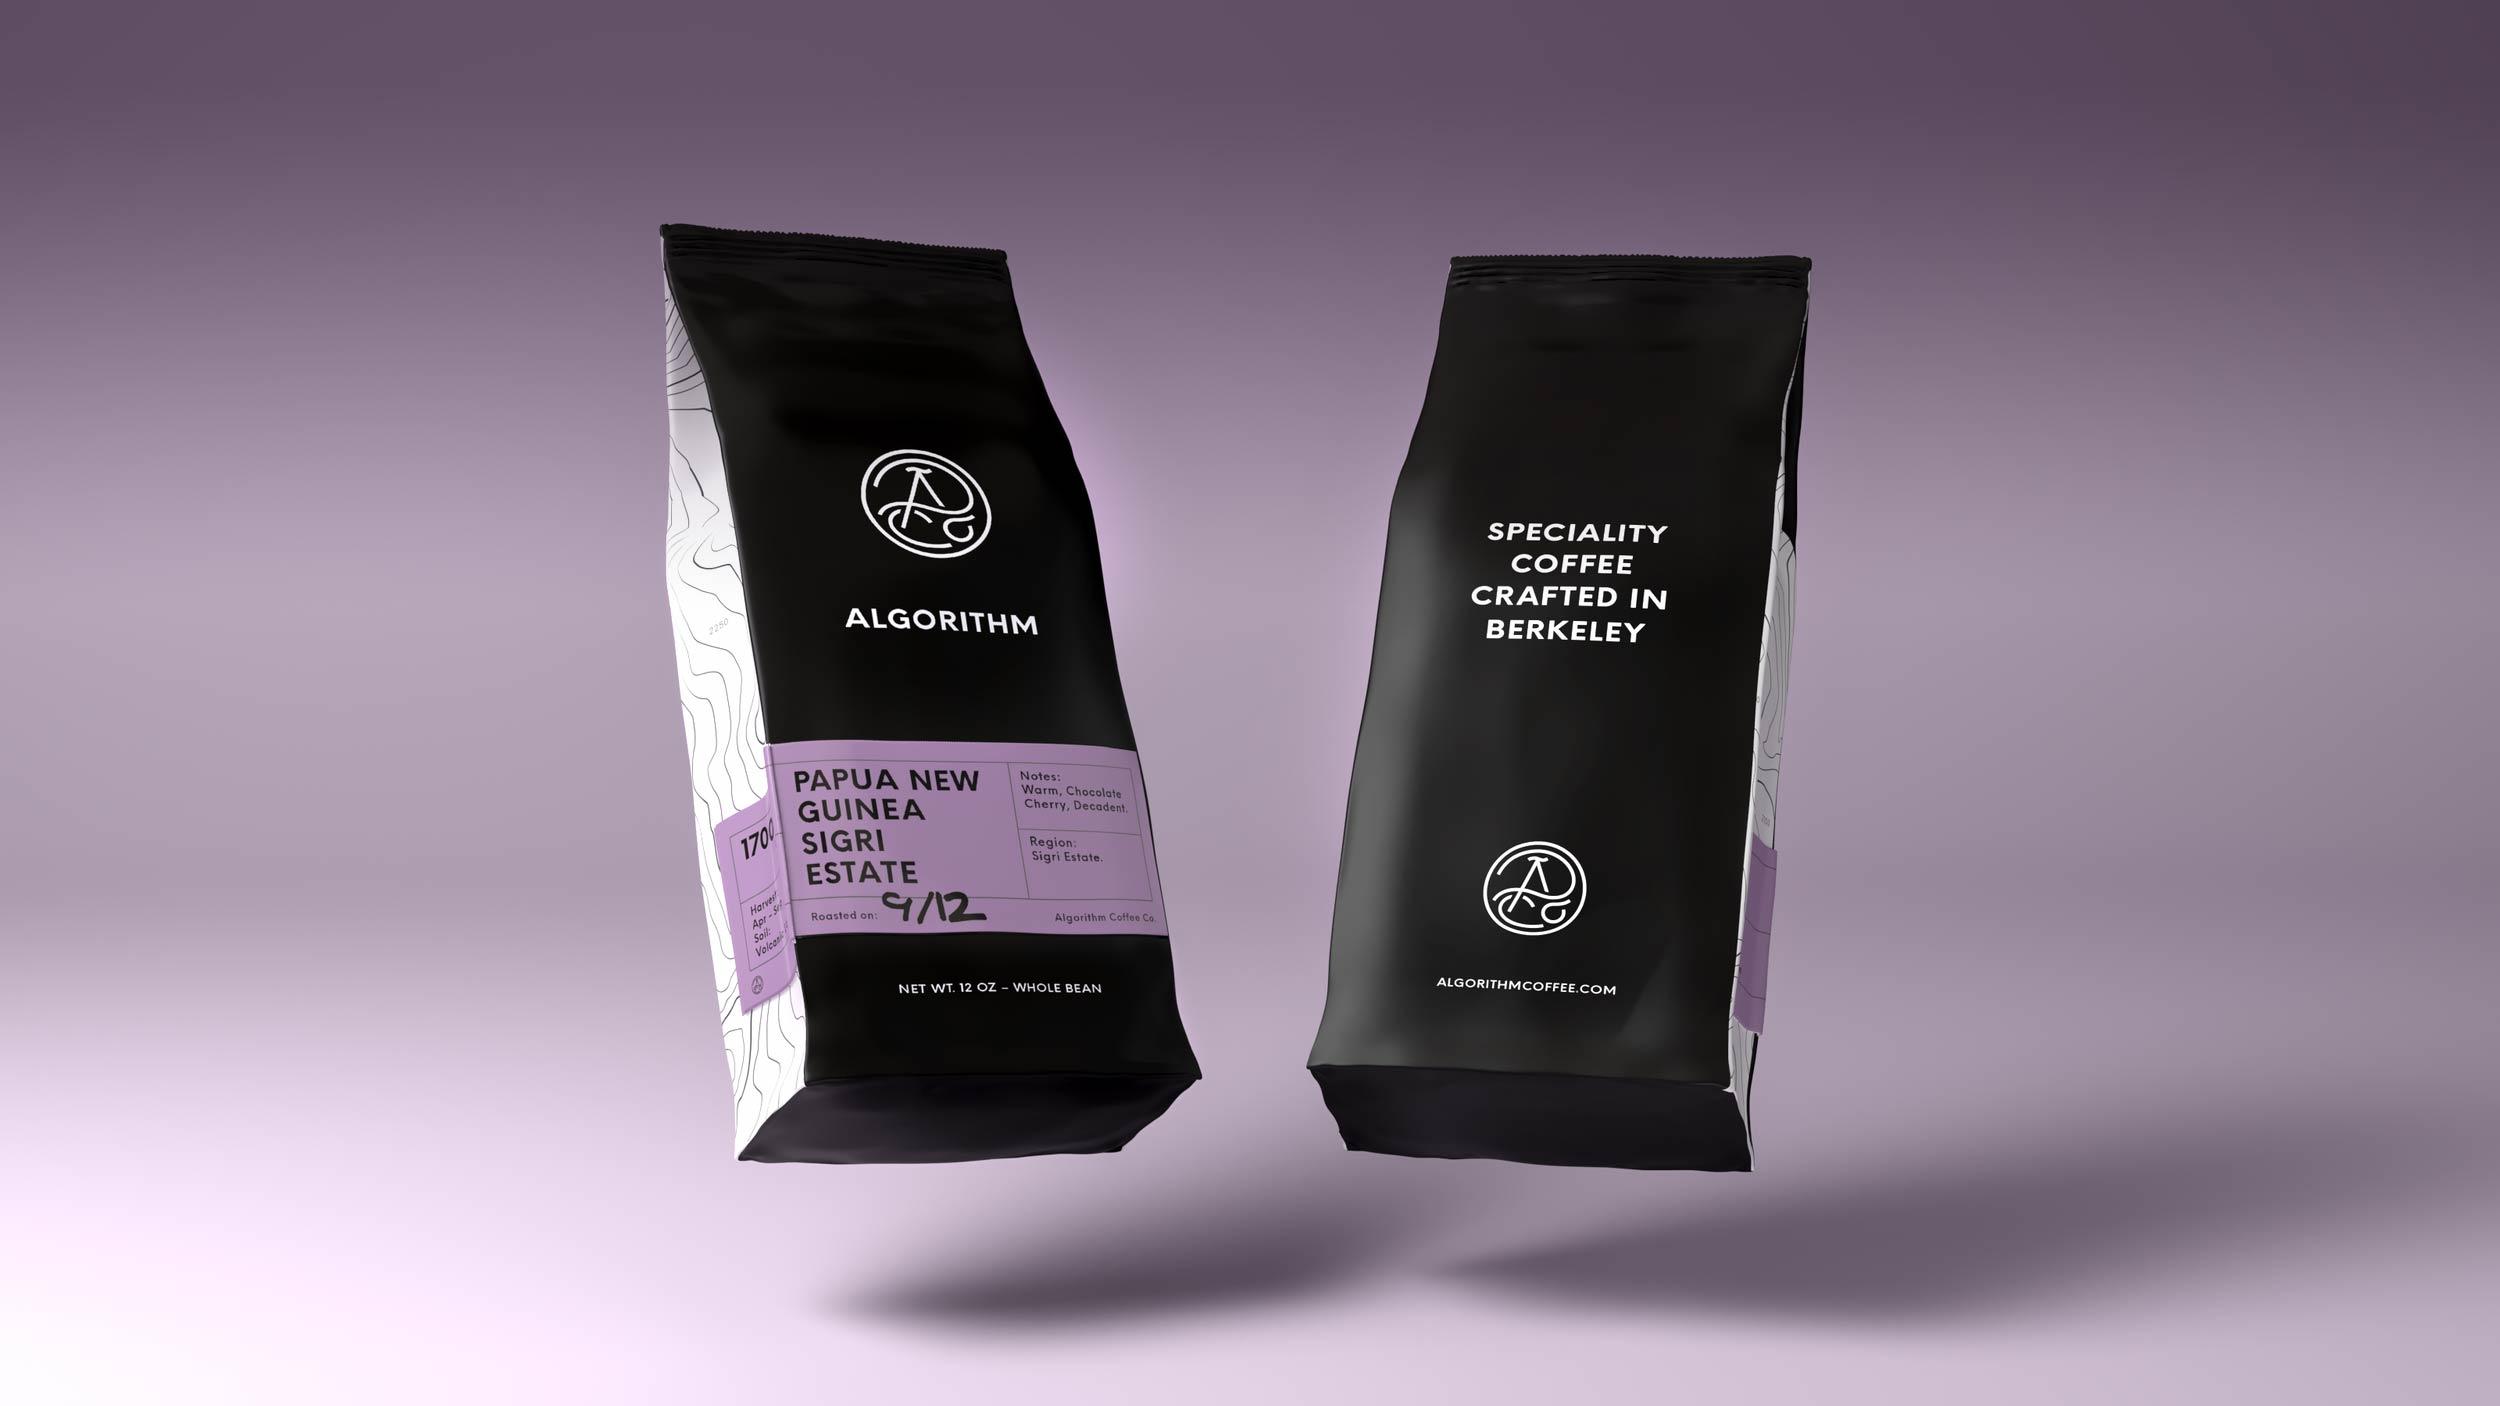 FA_algorithm_coffee.jpg